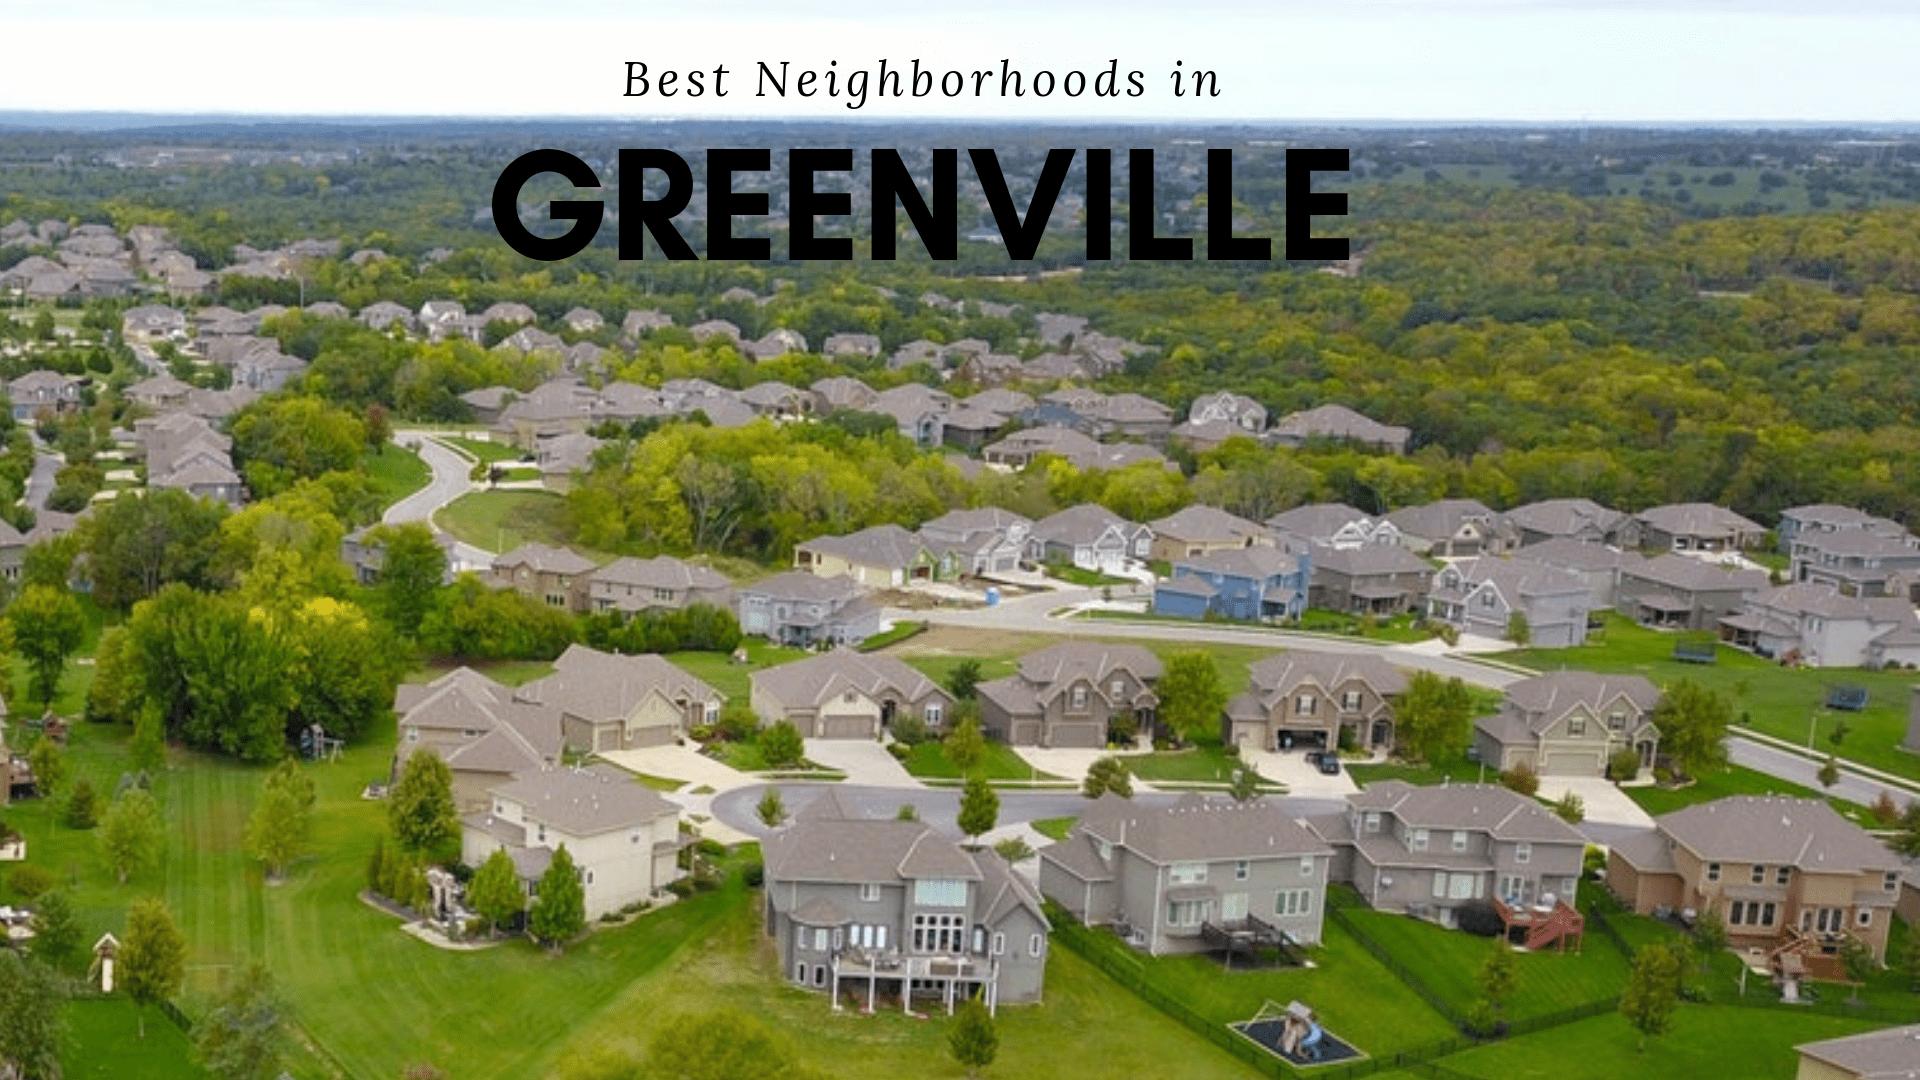 10 Best Greenville Neighborhoods to Live In